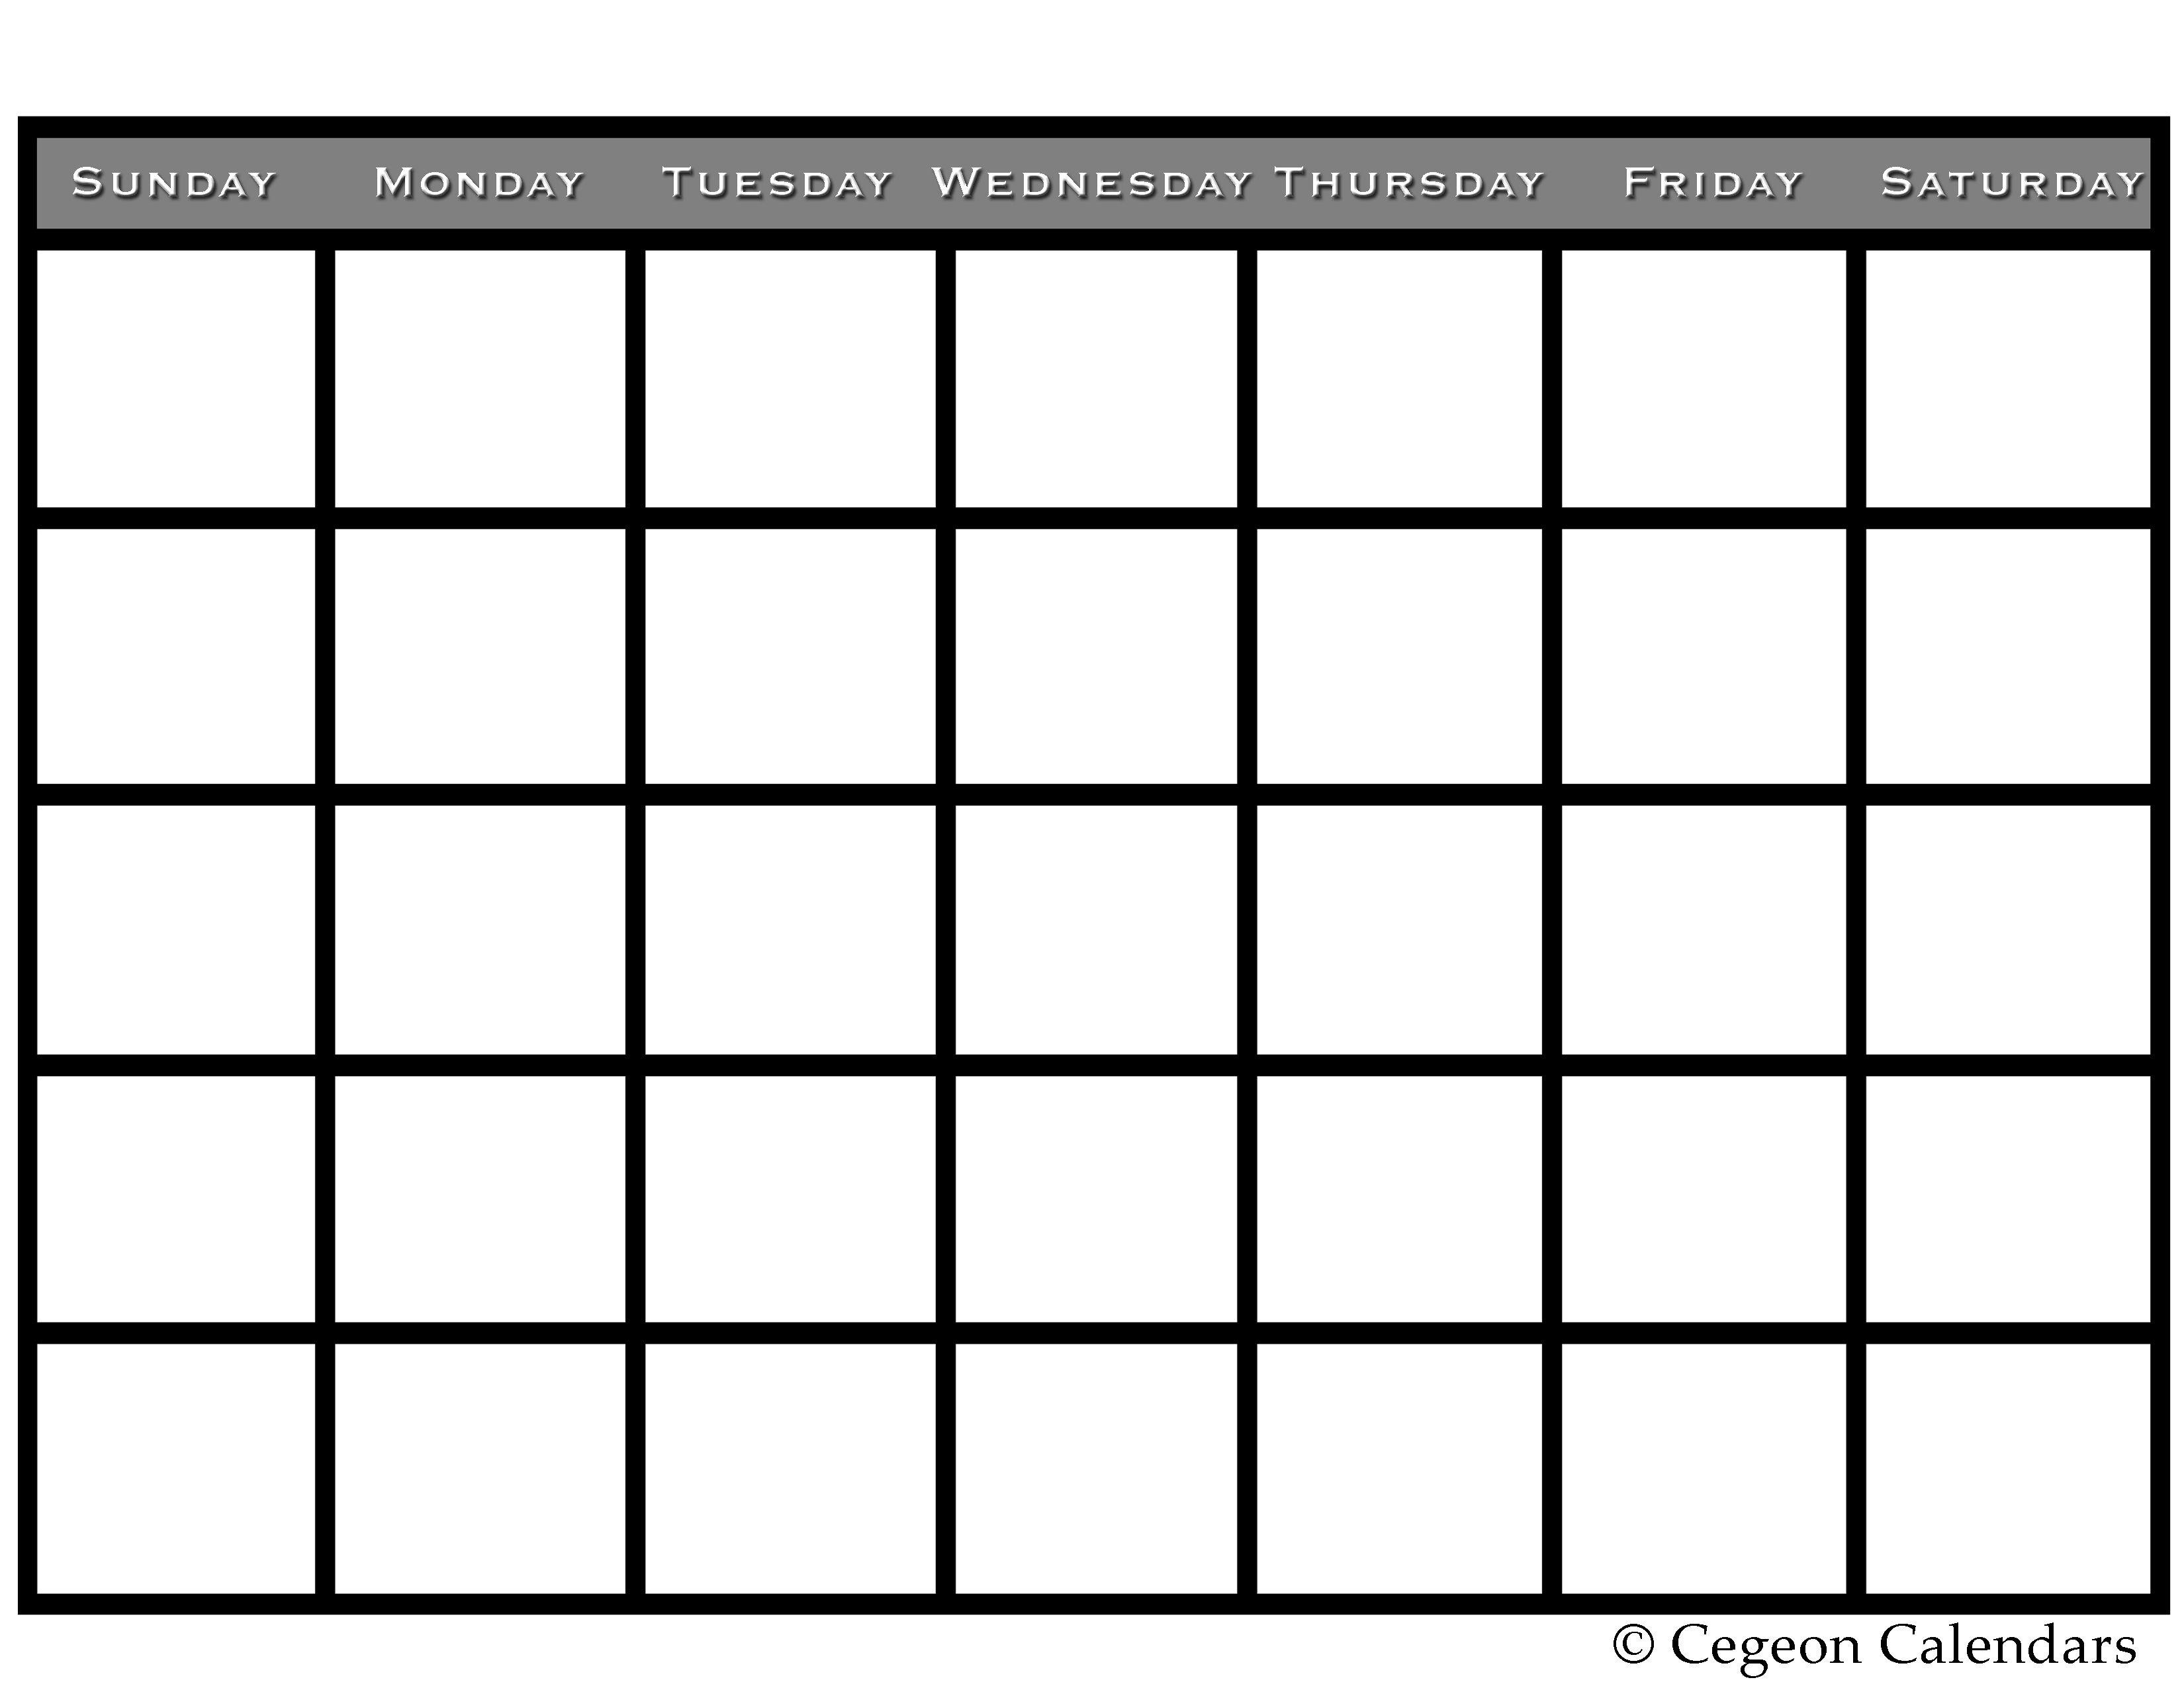 Get Your Free Printable Blank Calendar | Printables | Printable_Free Calendar Blanks To Print